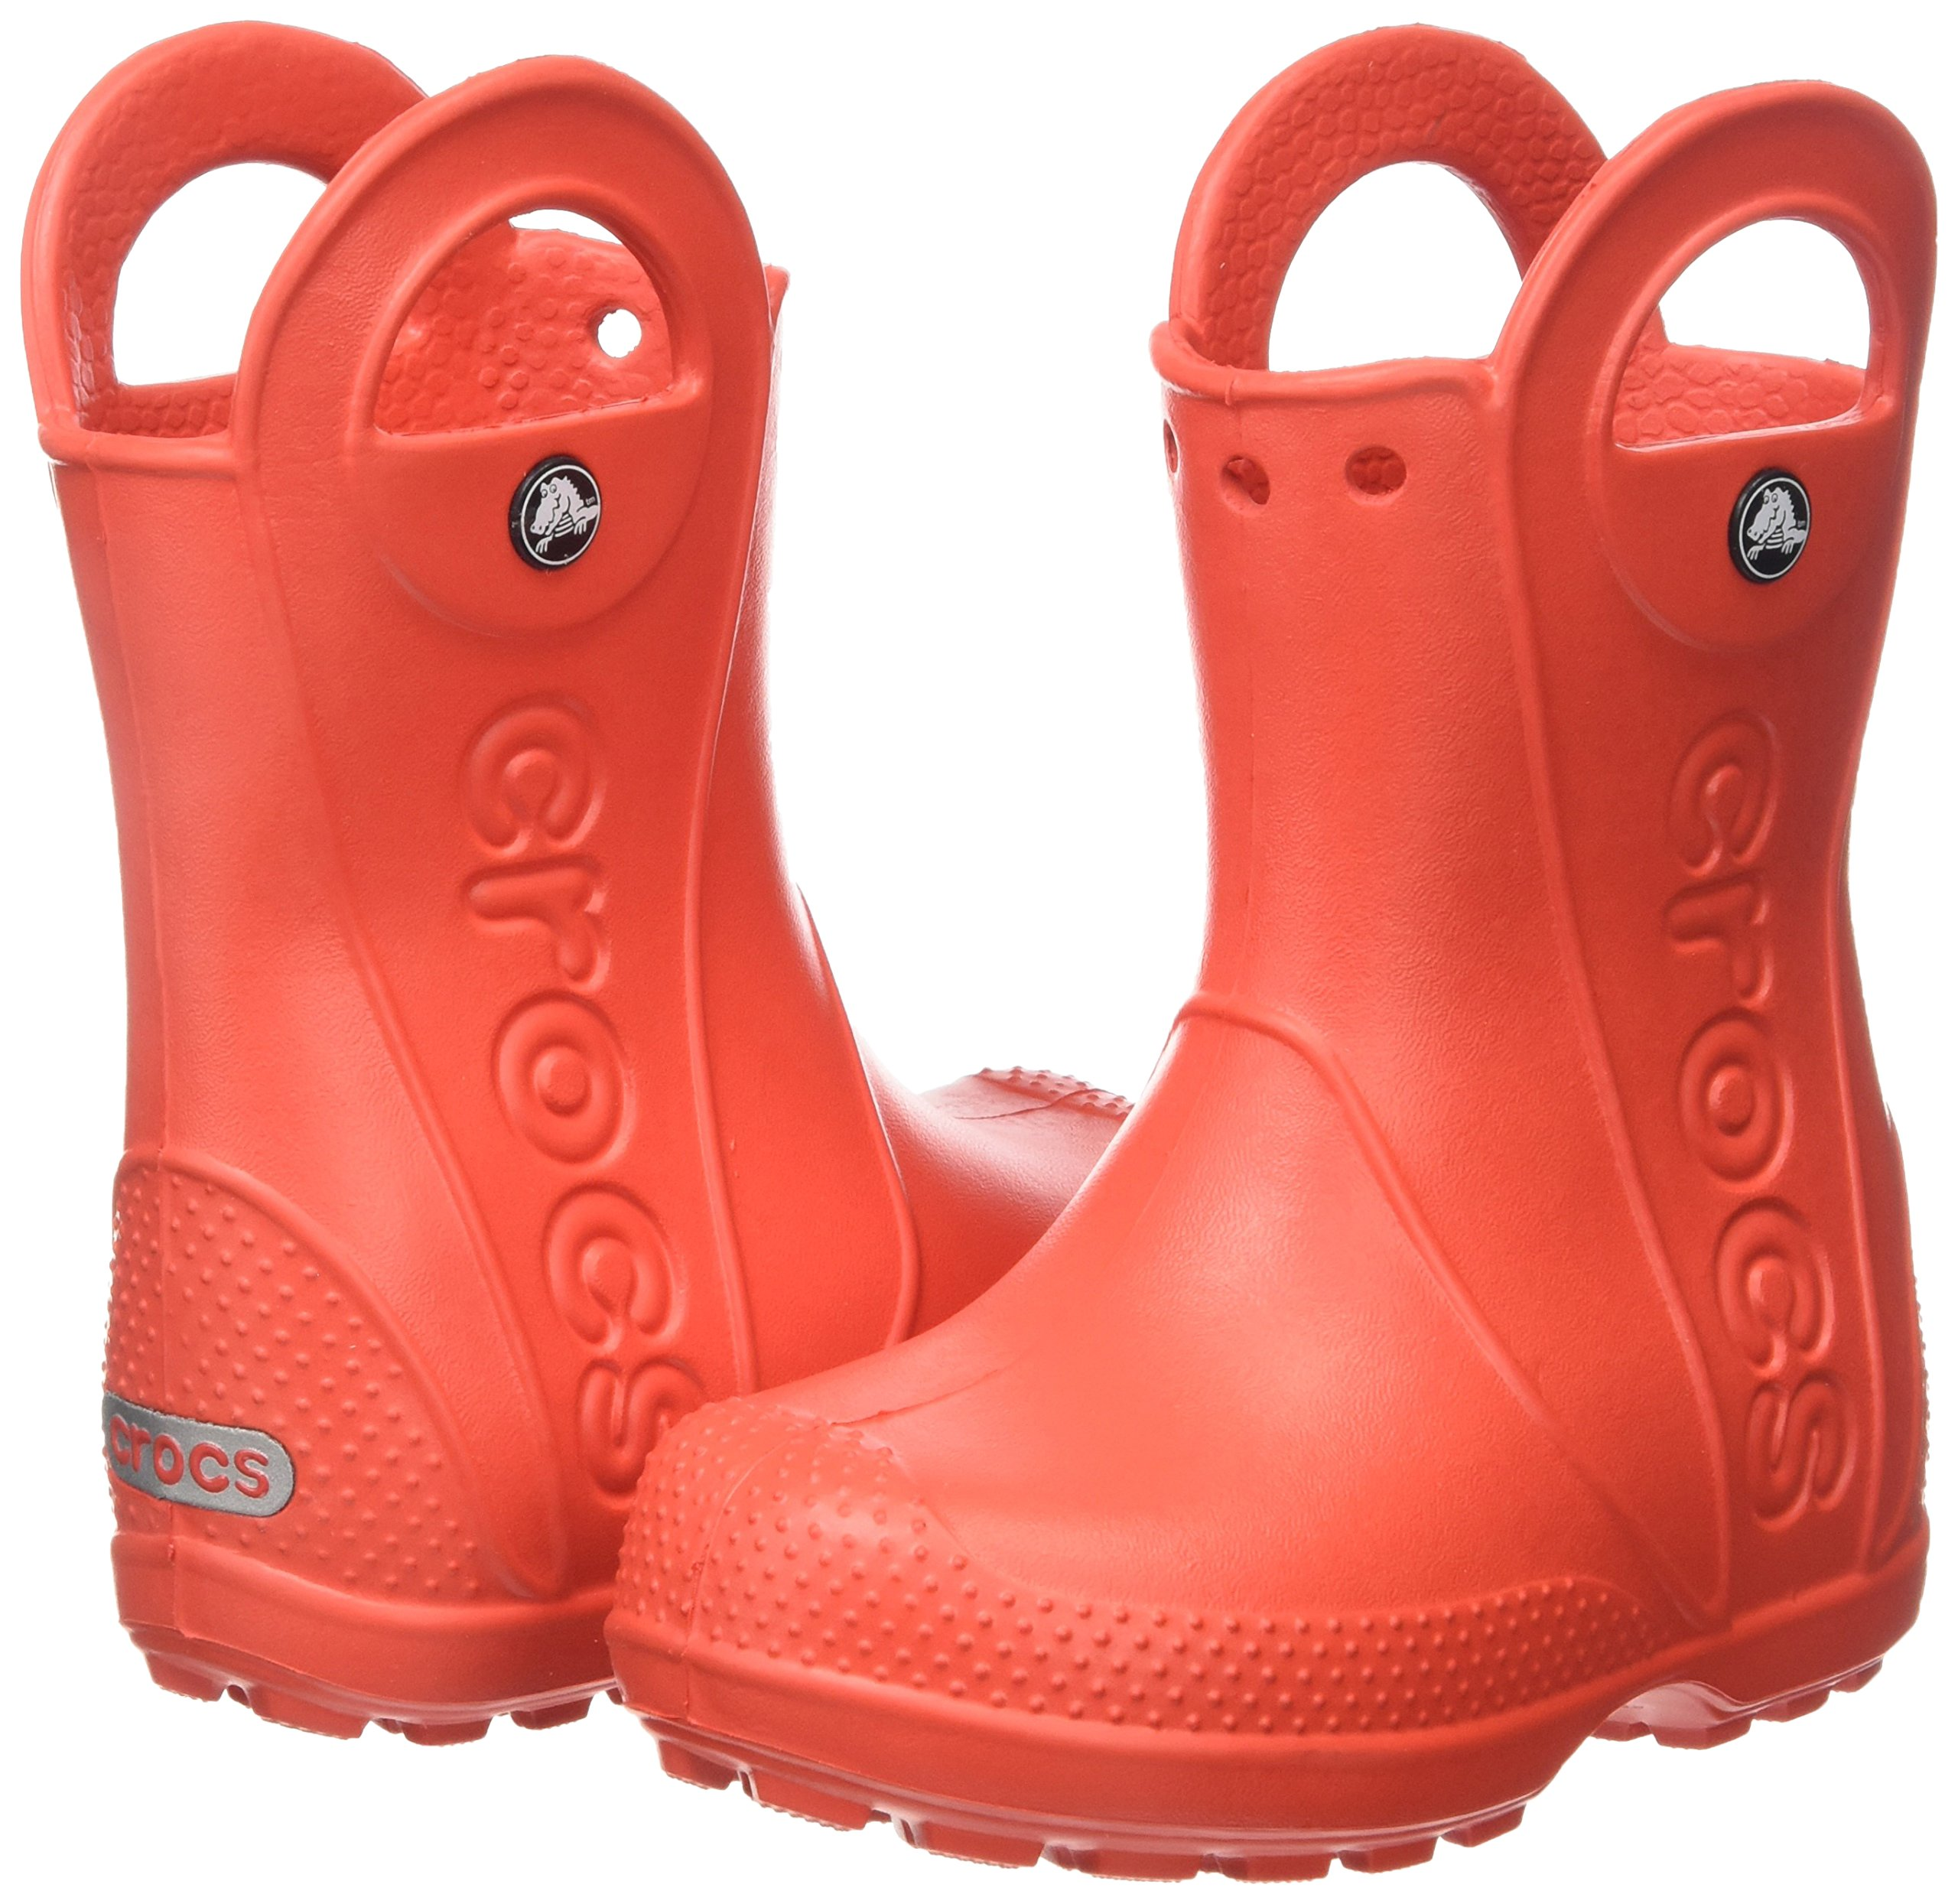 Crocs Kids' Handle It Rain Boot, Flame, 8 M US Toddler by Crocs (Image #5)